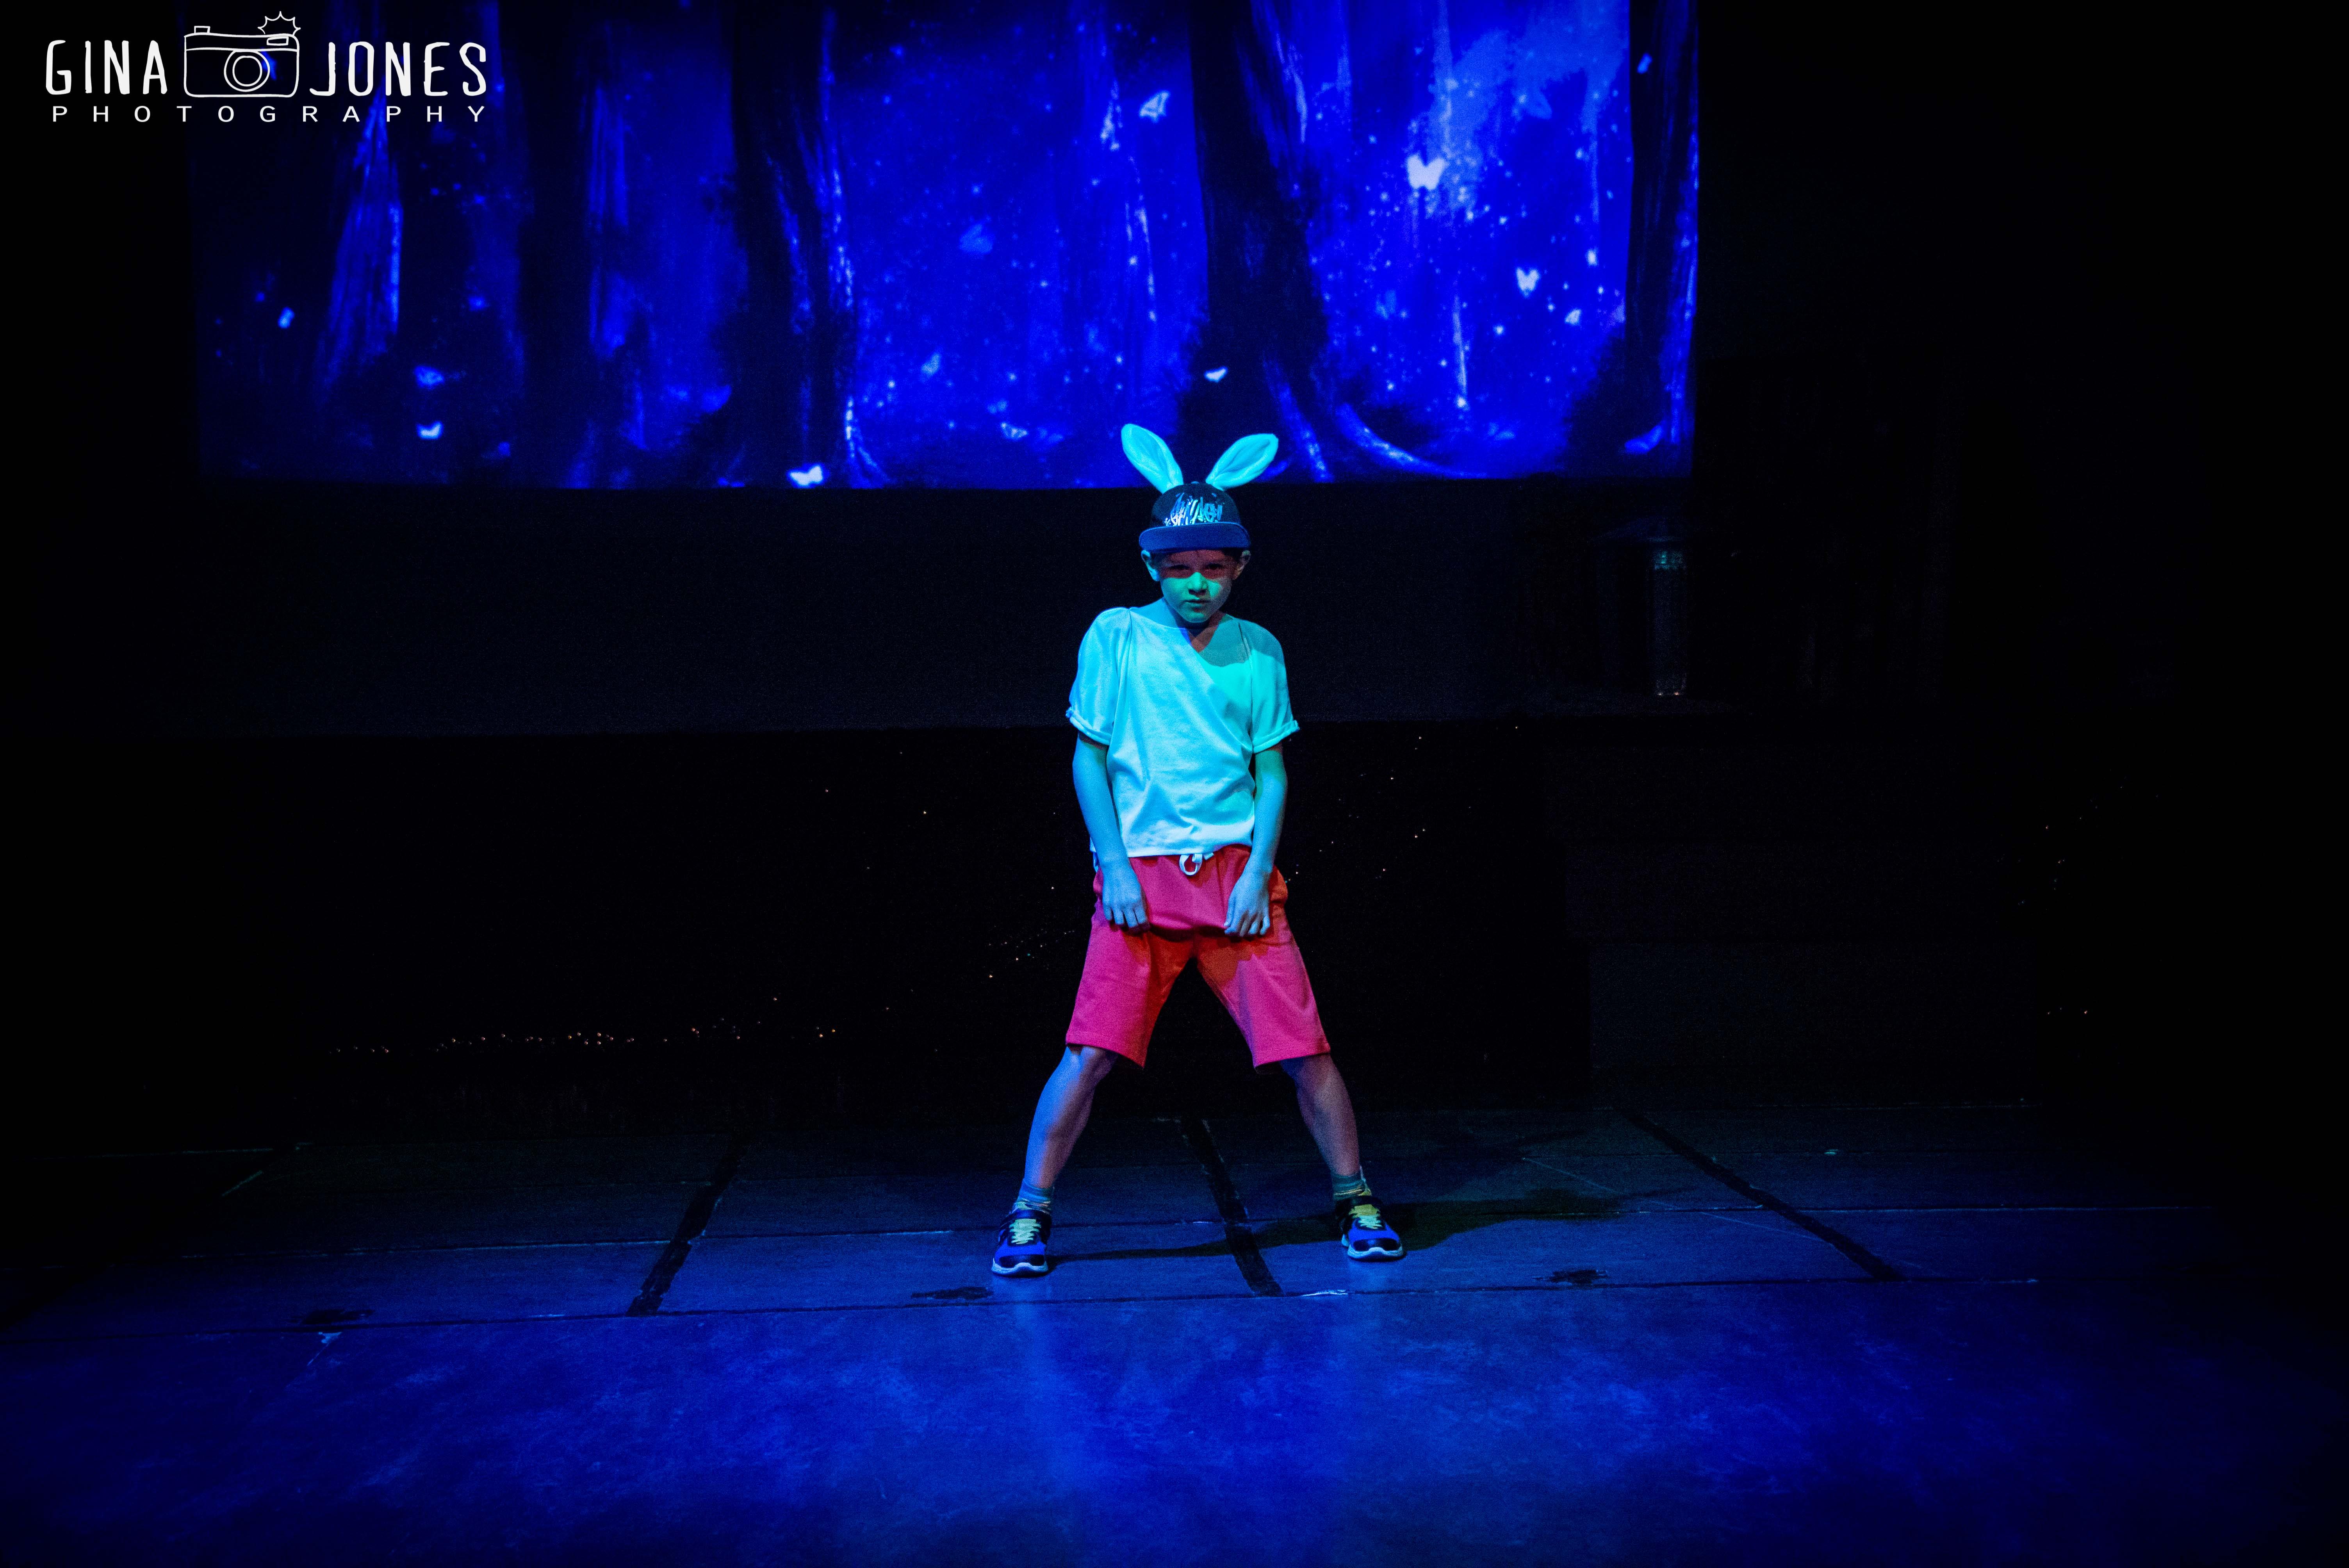 Jack Rabbit Dancer